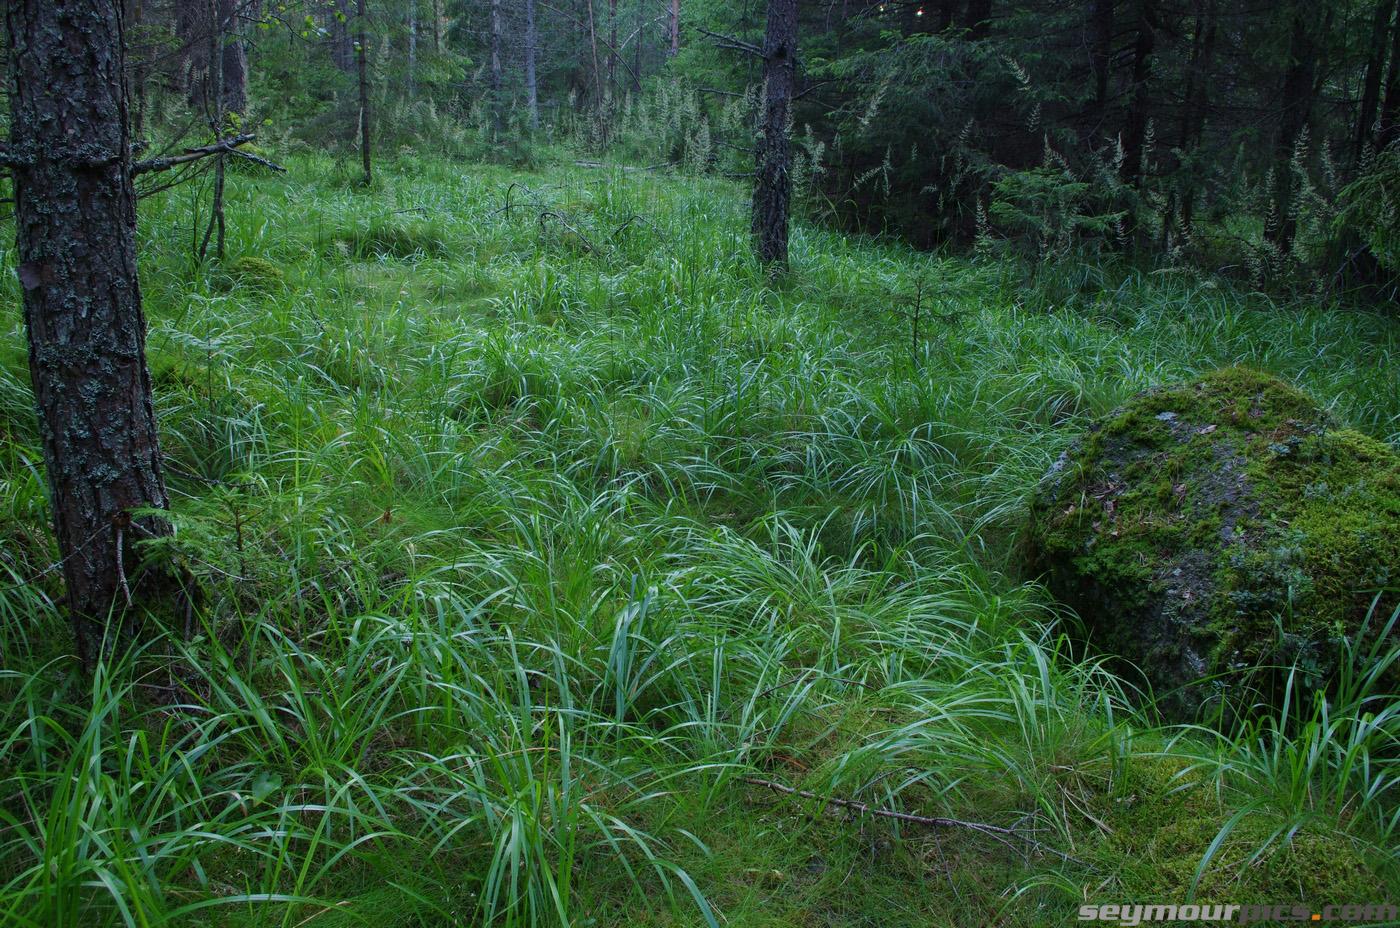 seymourpics-wallpaper-finland-forest-glade_1400px.jpg